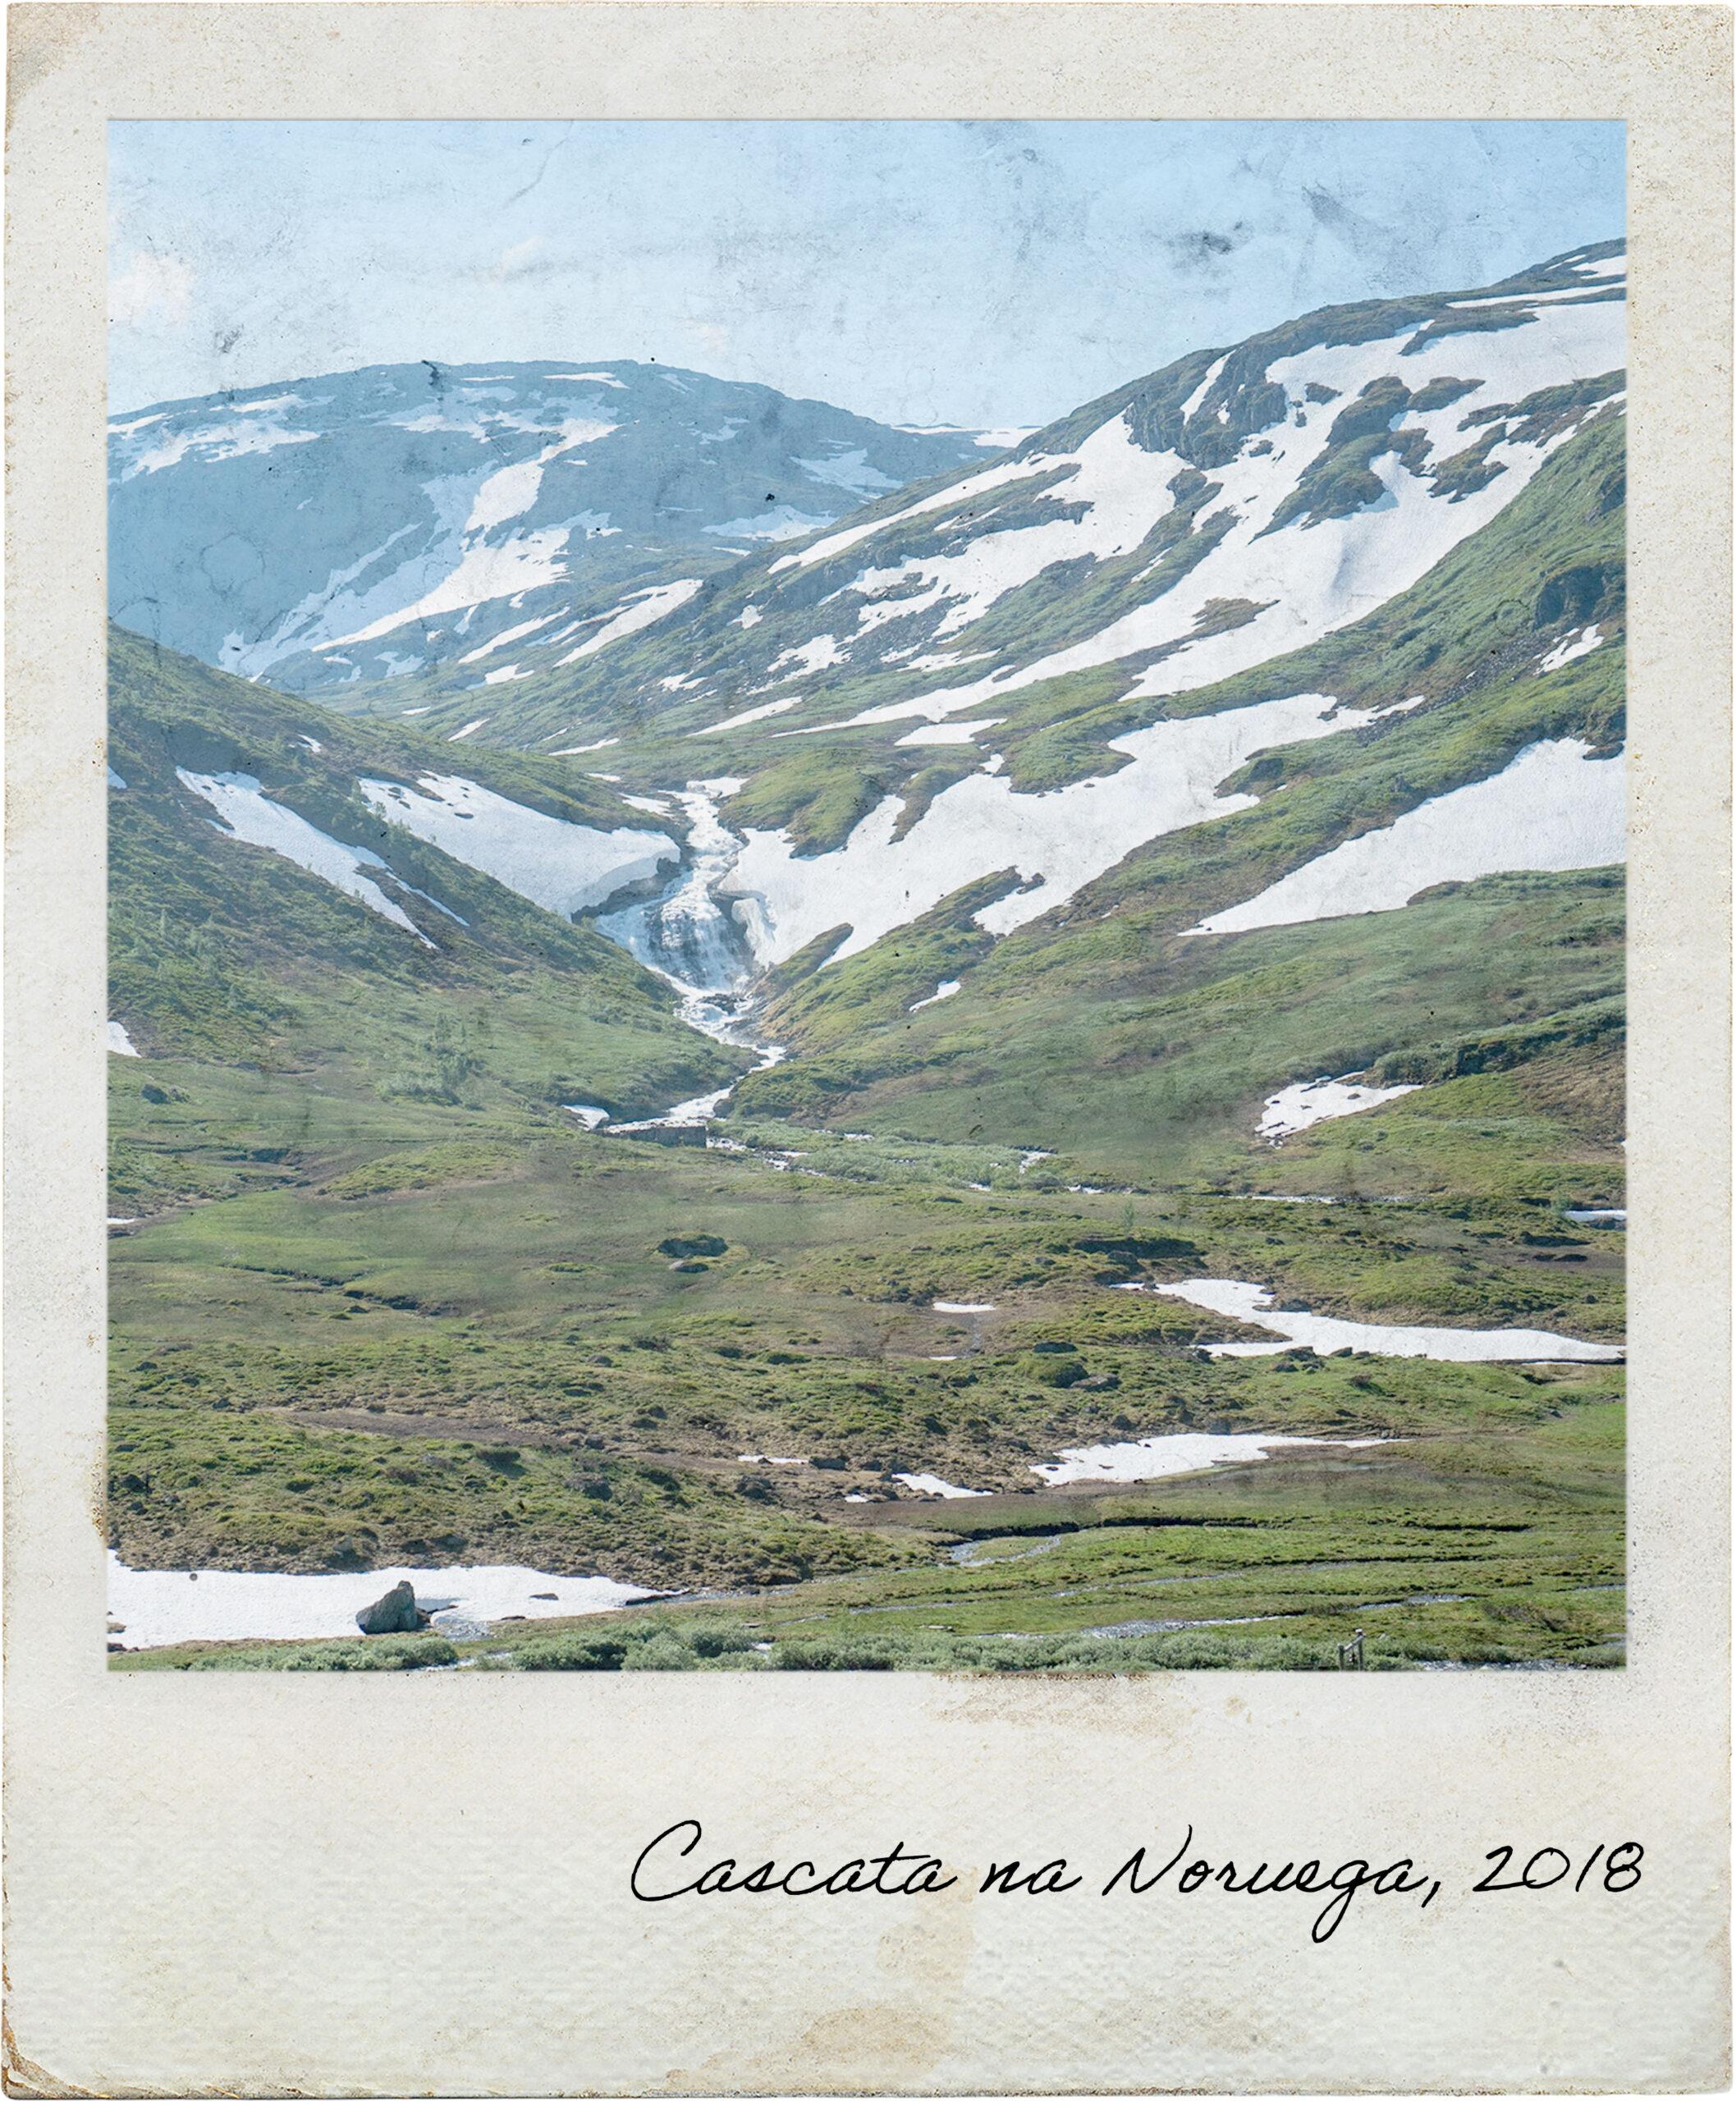 Neve e cascata no interior da Noruega